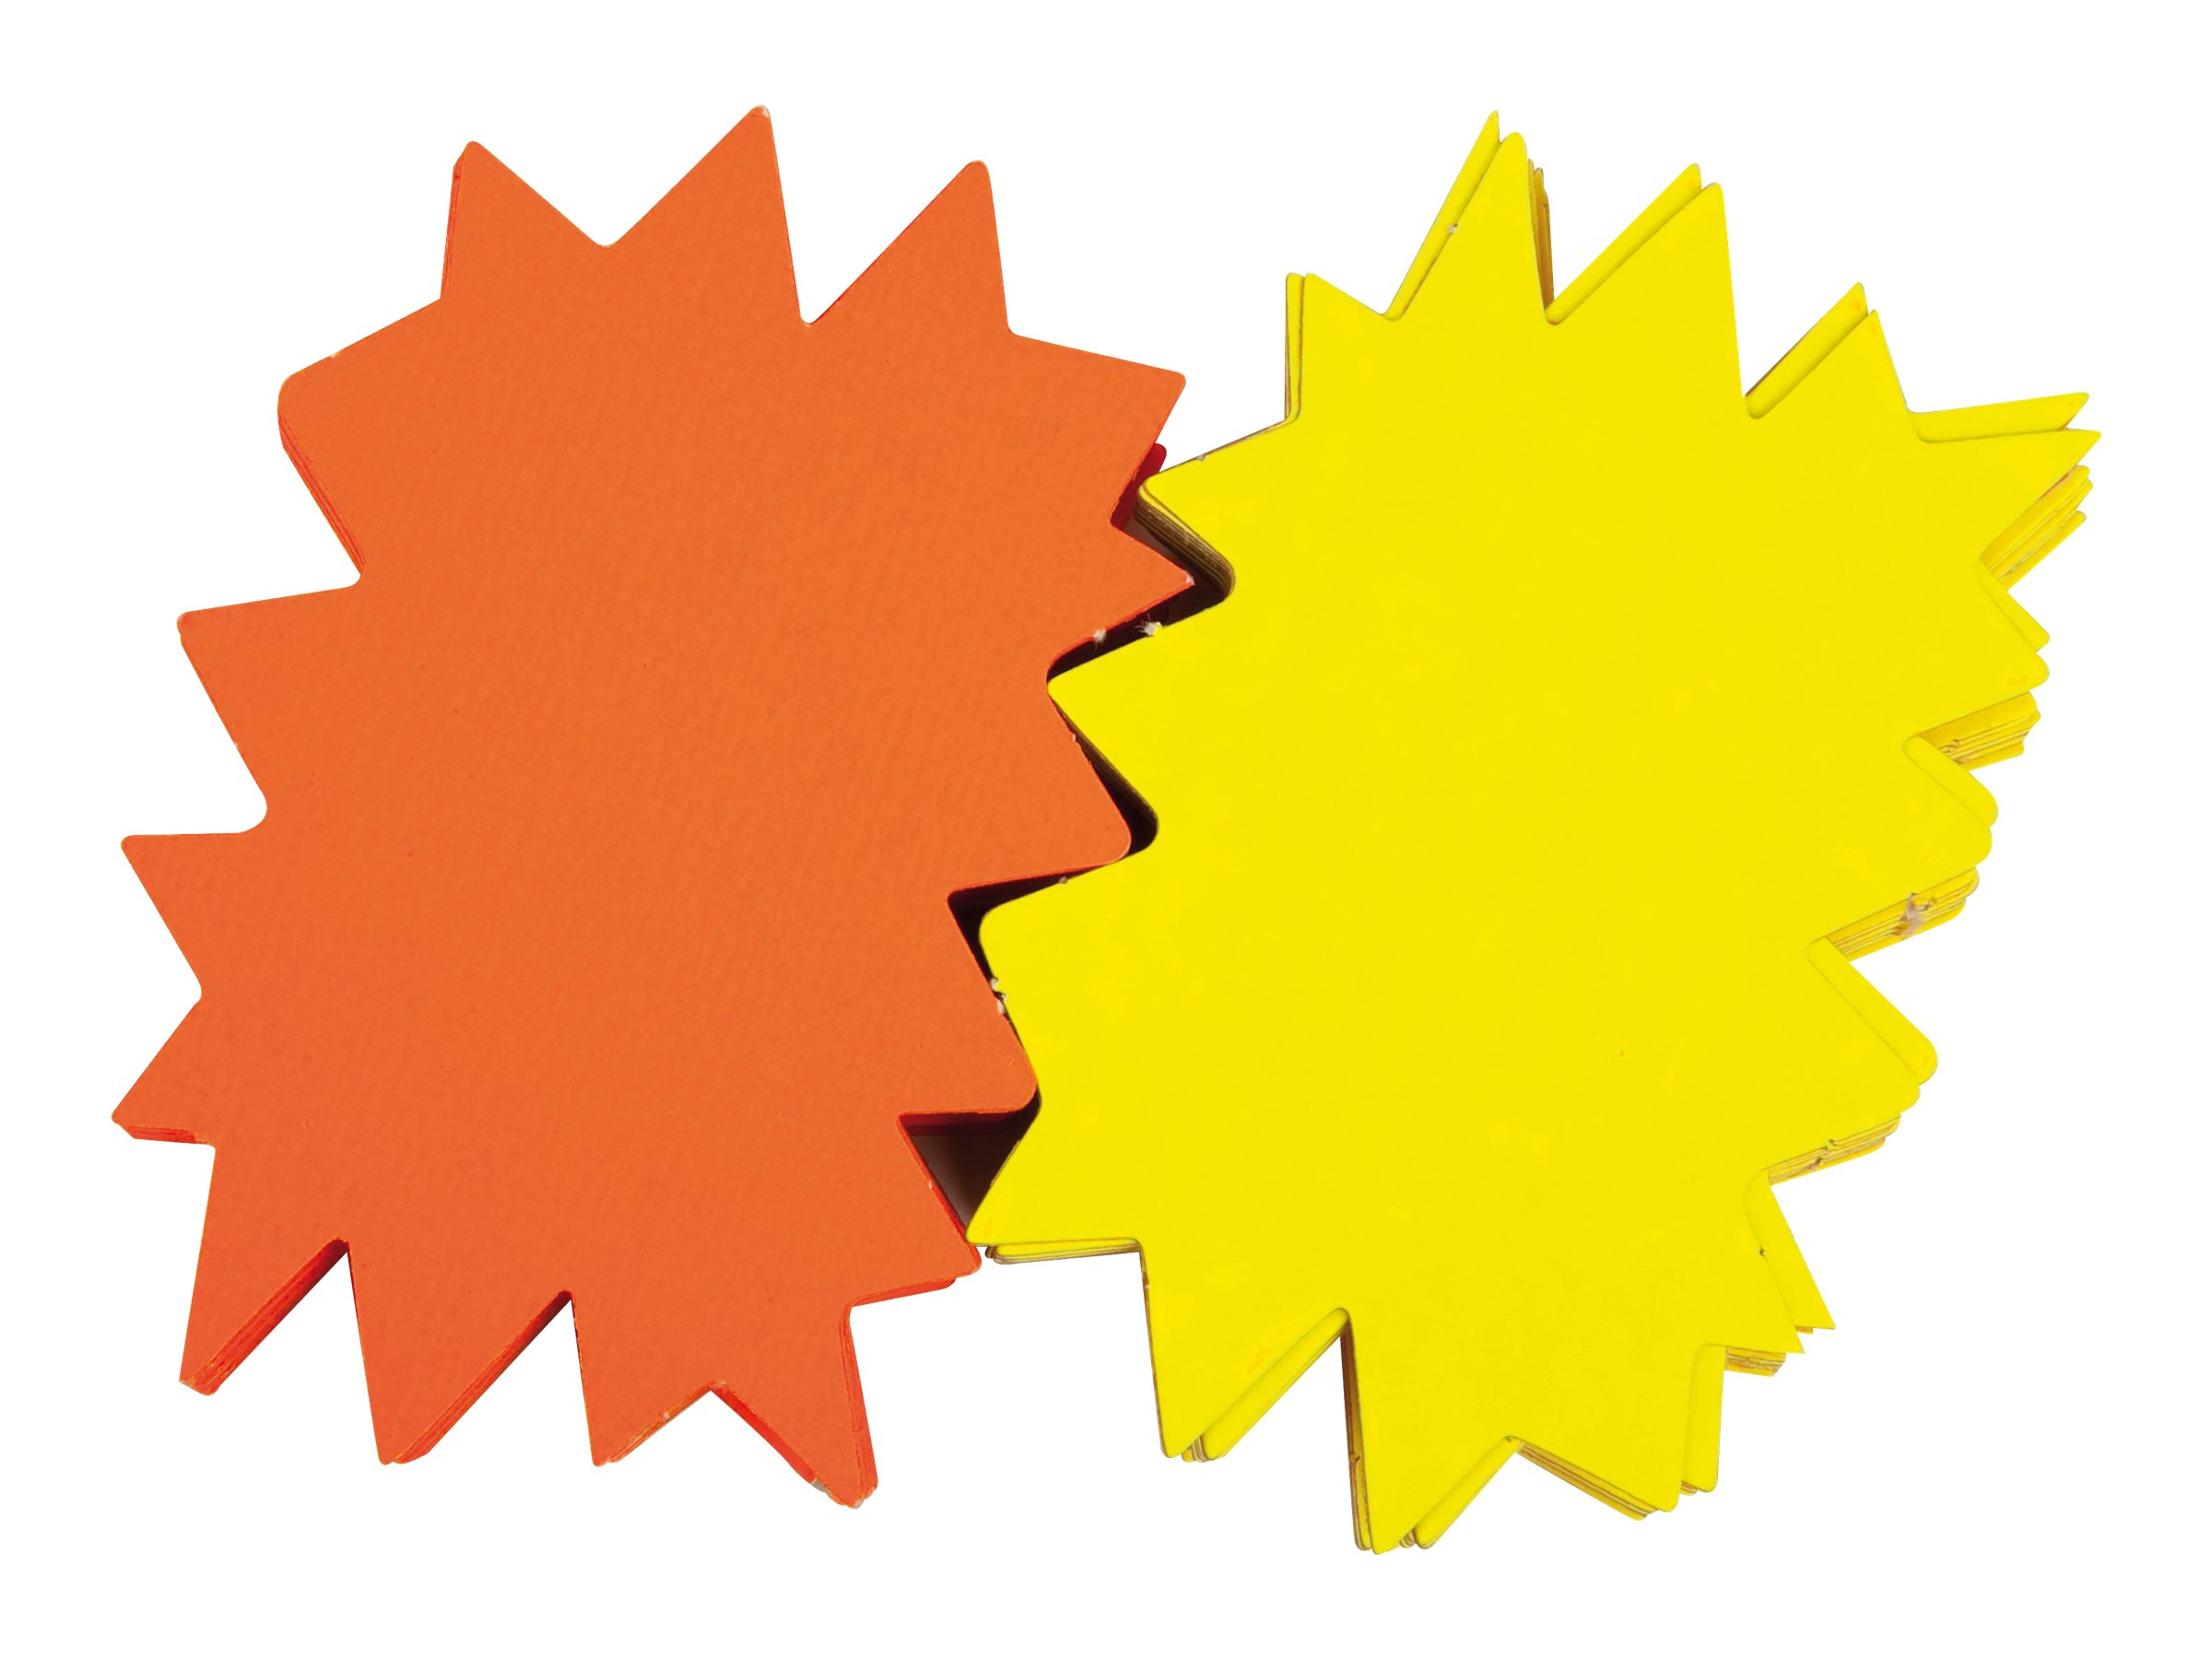 Apli Agipa - 10 éclatés fluo non effaçables - jaune/orange - 48 x 64 cm